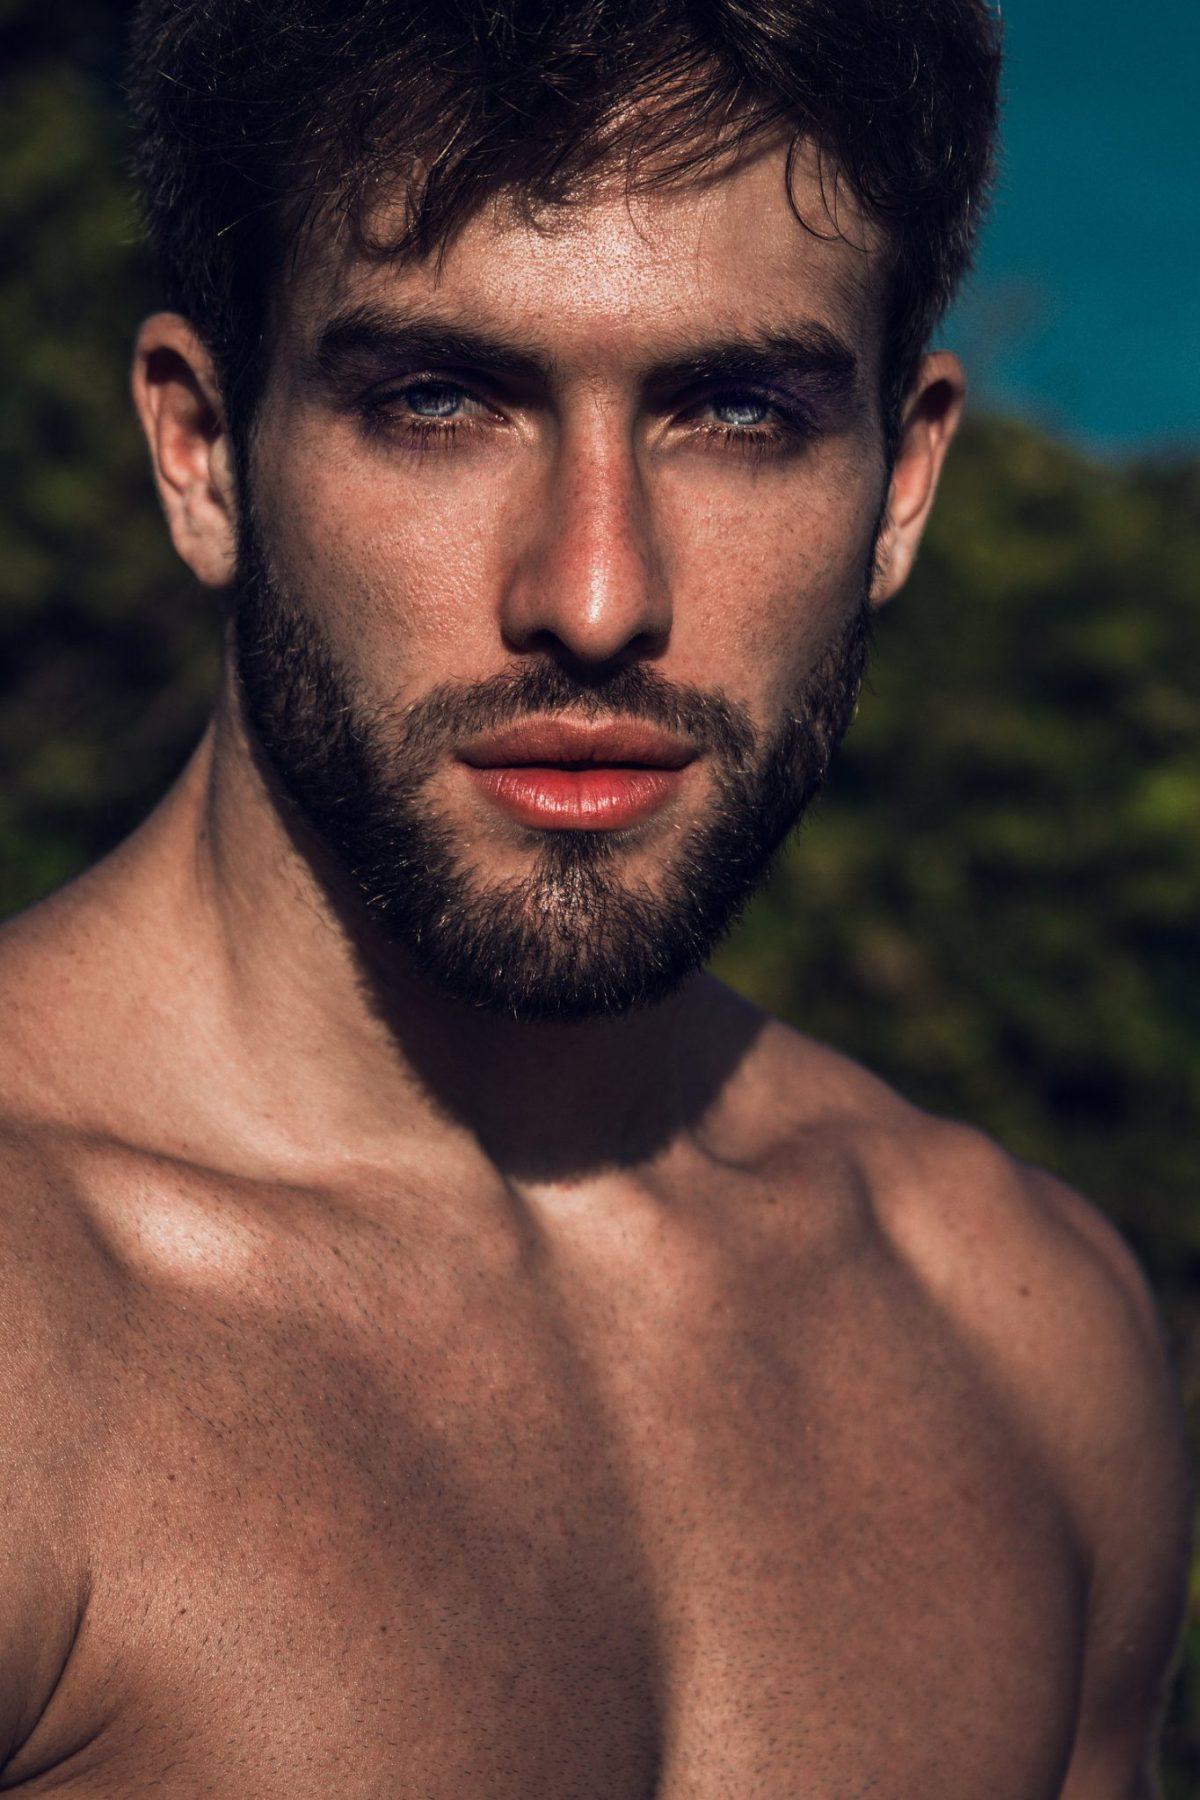 Gabriel Duarte Meira by Andre Costa